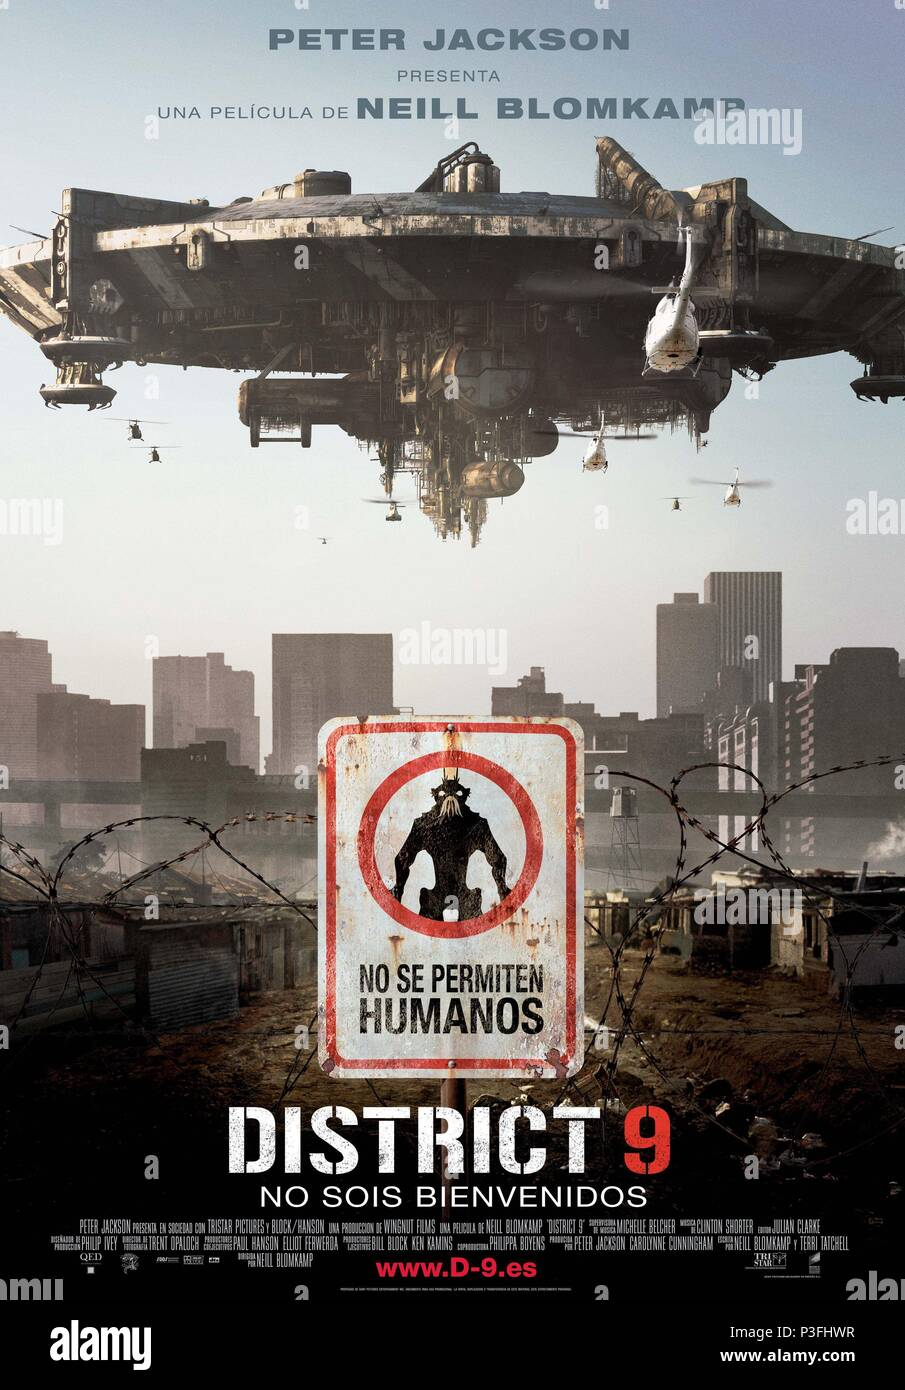 Original Film Title: DISTRICT 9.  English Title: DISTRICT 9.  Film Director: NEILL BLOMKAMP.  Year: 2009. Credit: WINGNUT FILMS / Album - Stock Image